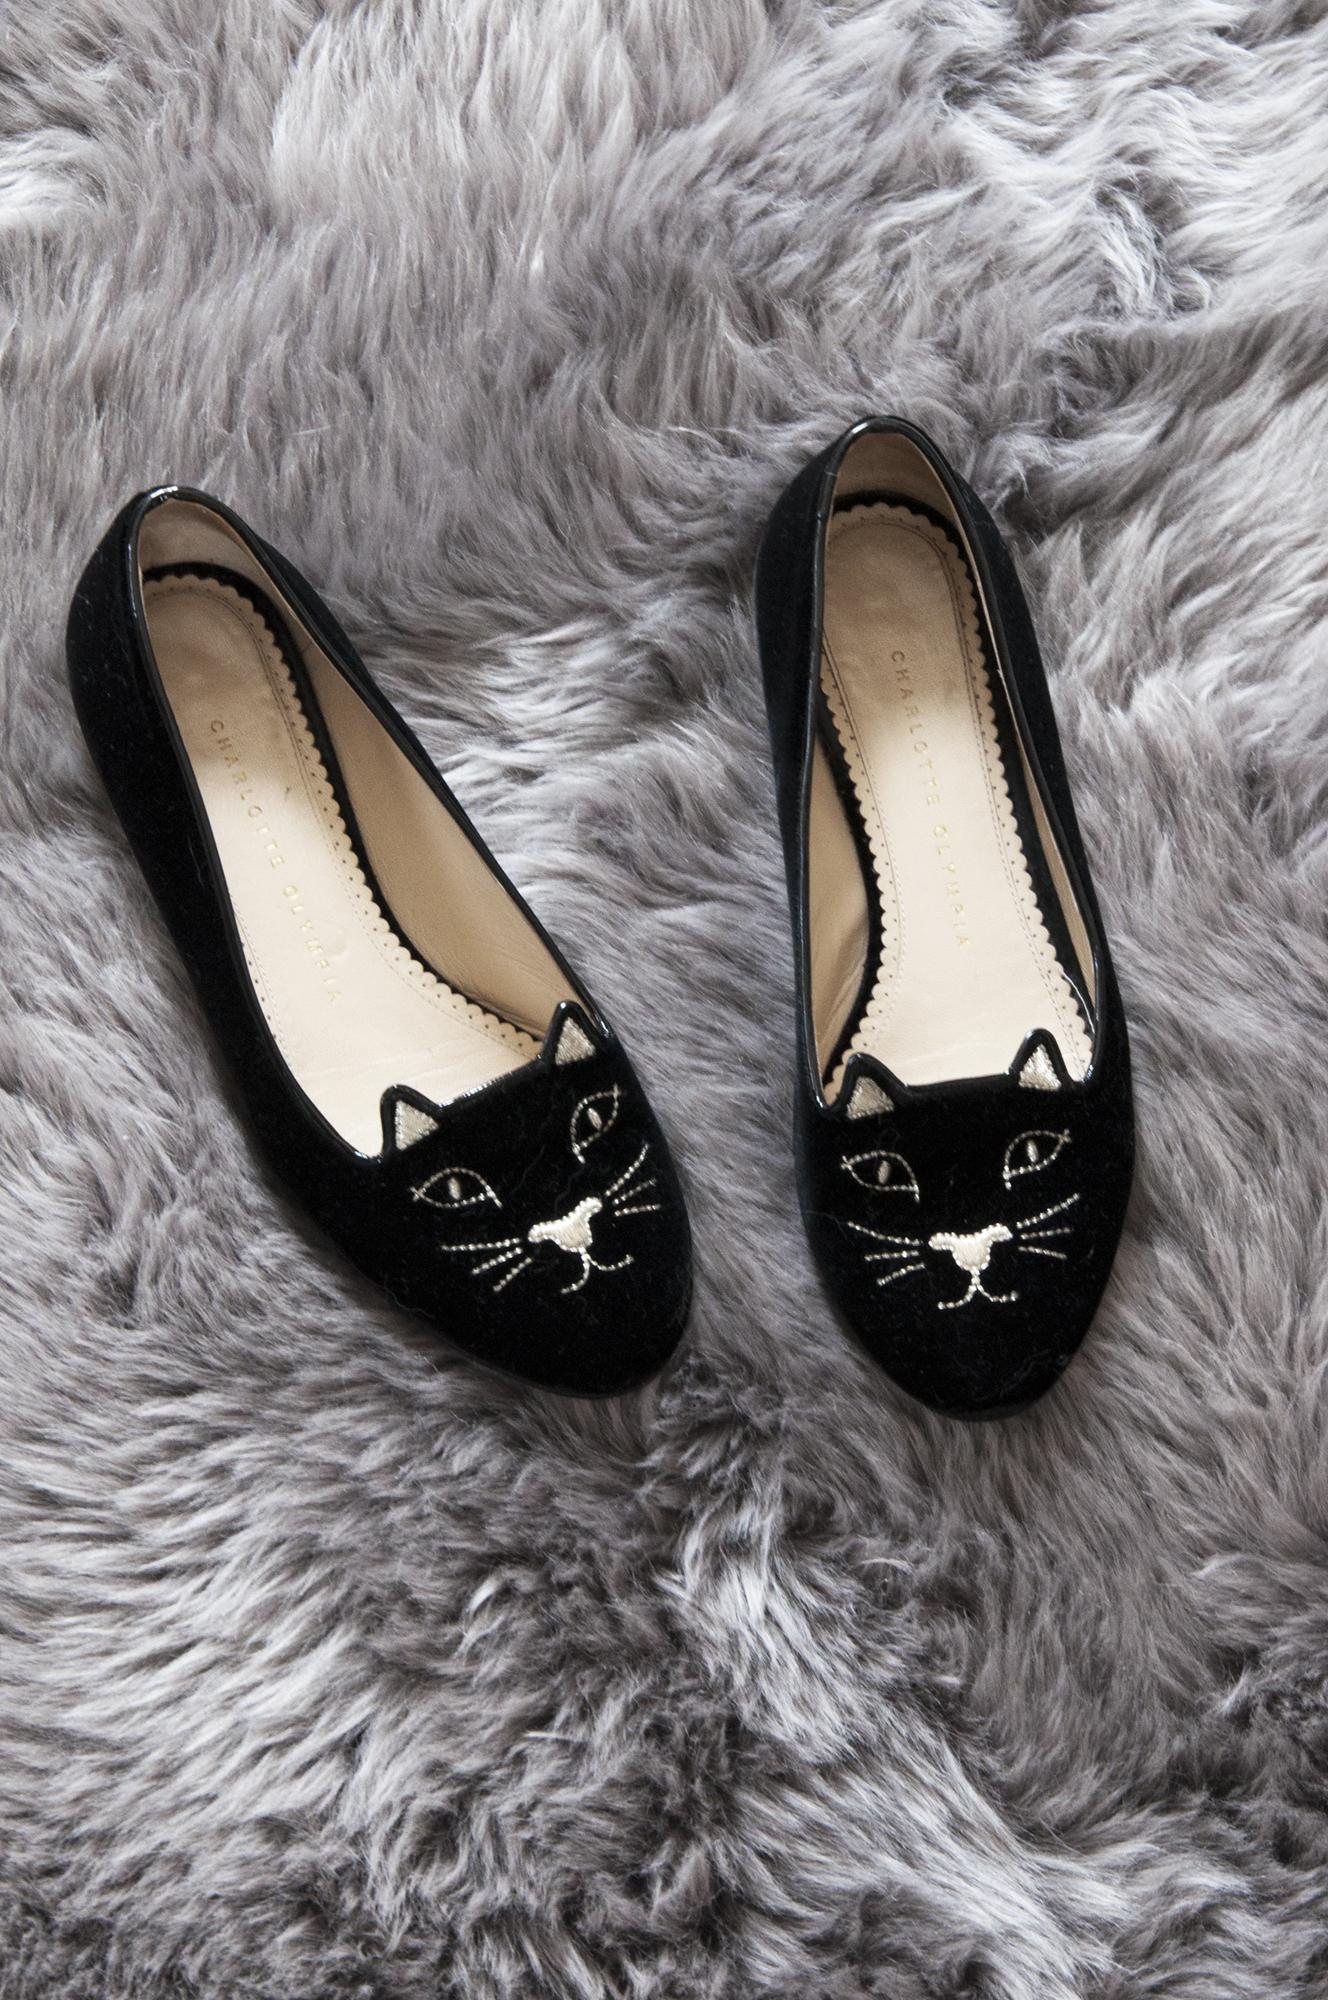 charlotte olympia shoes.jpg